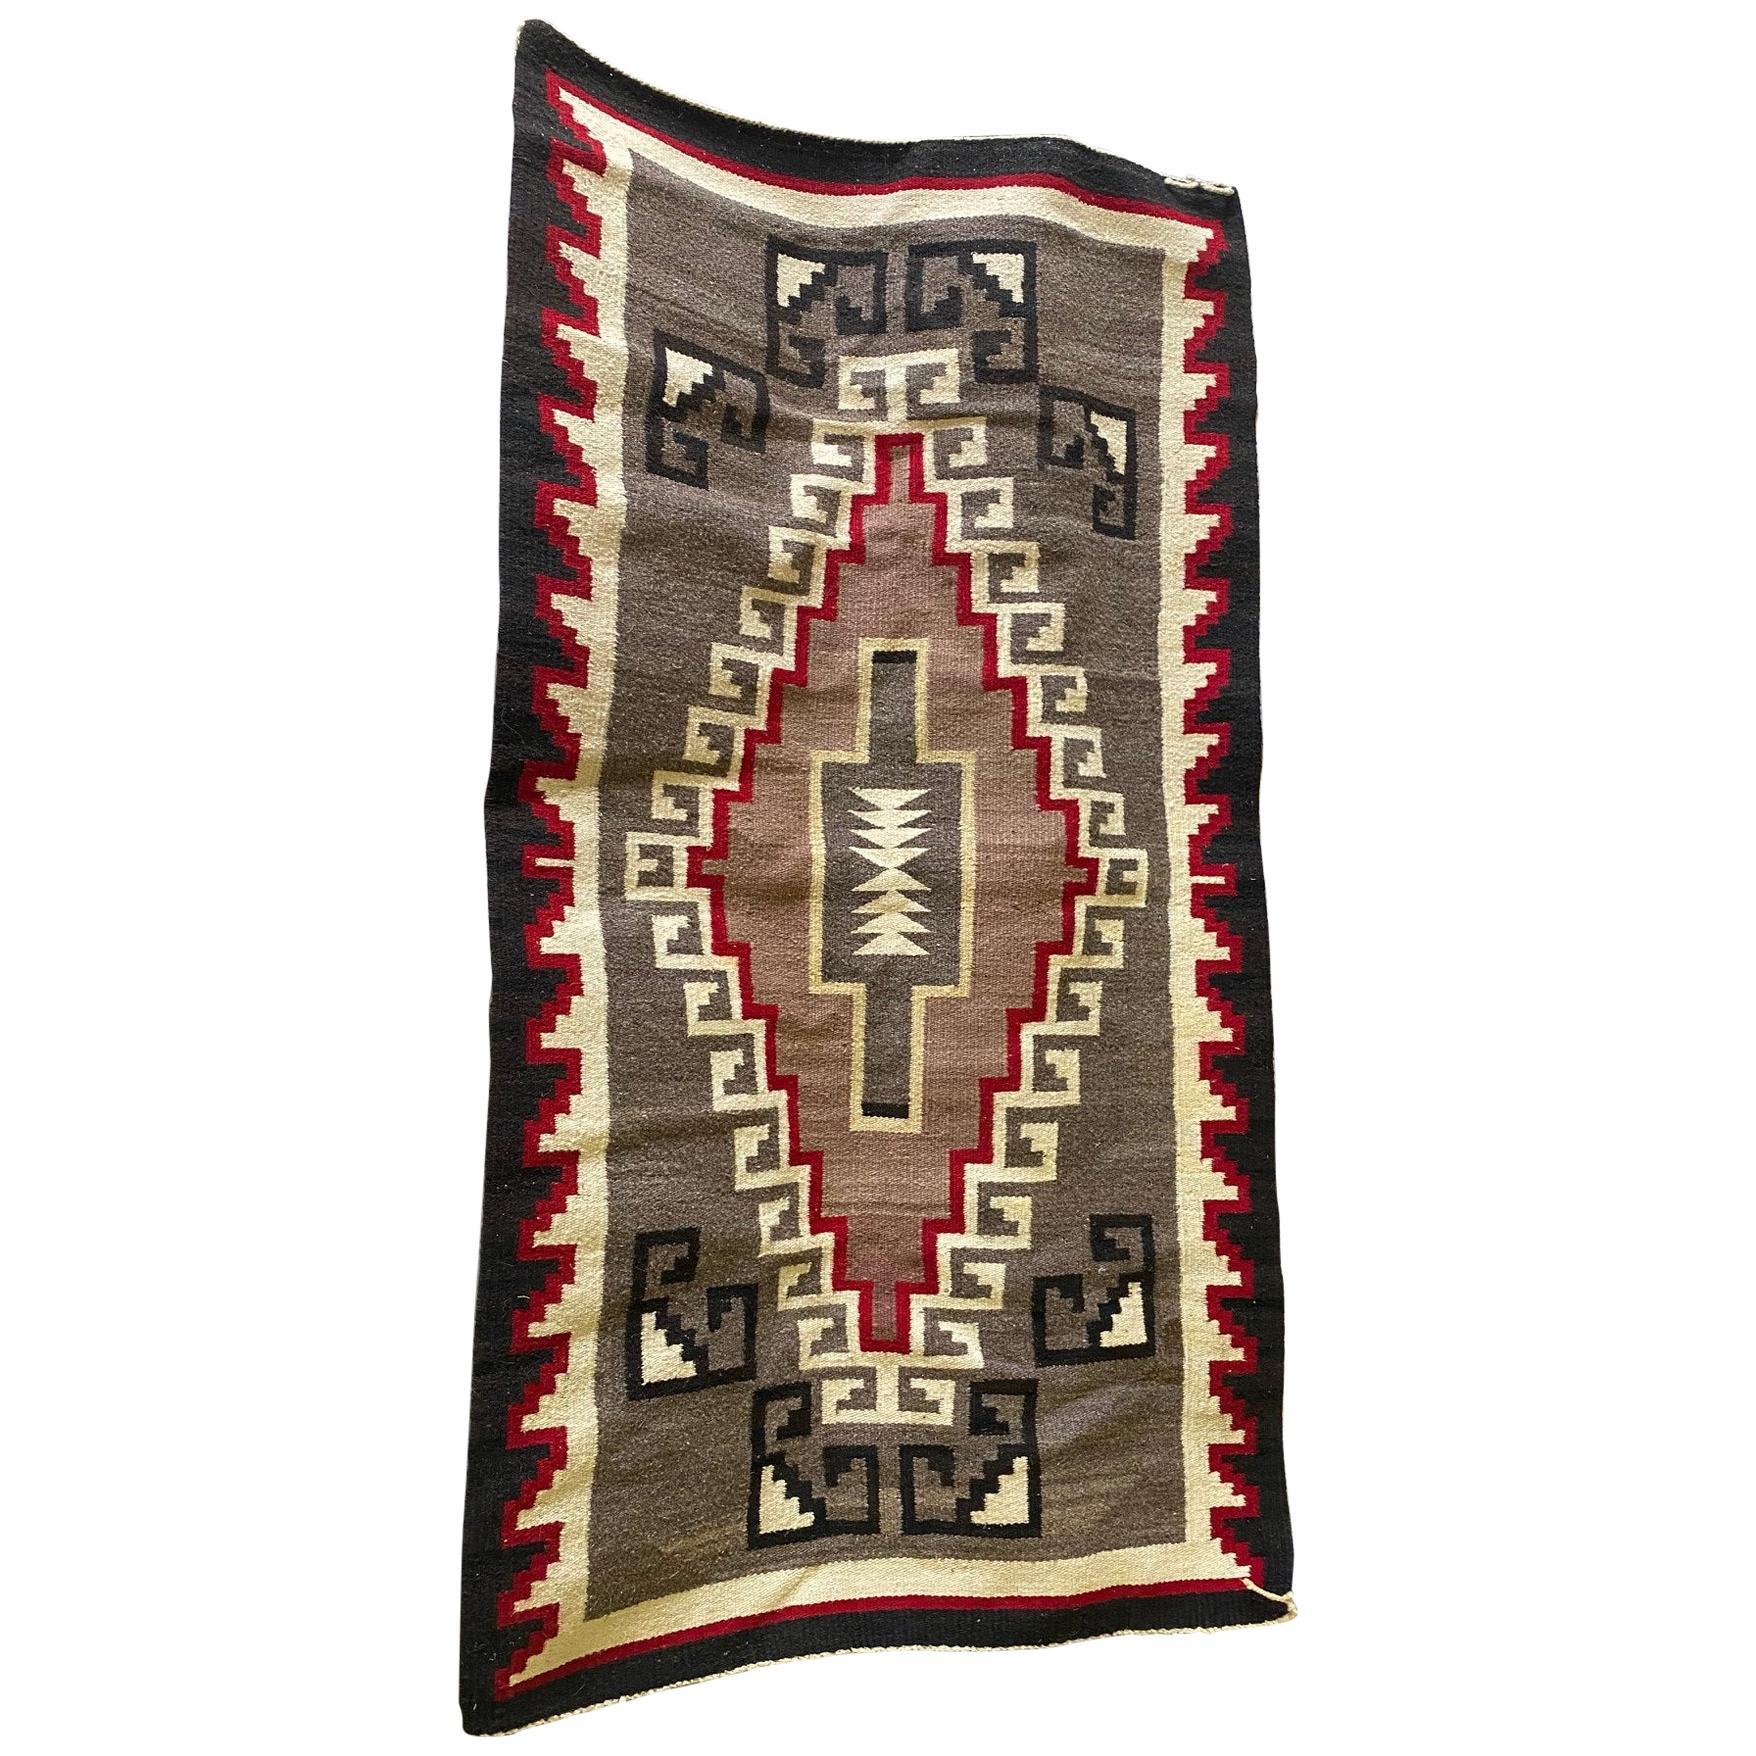 Native American Navajo Colorful Handwoven Geometric Pattern Blanket Rug